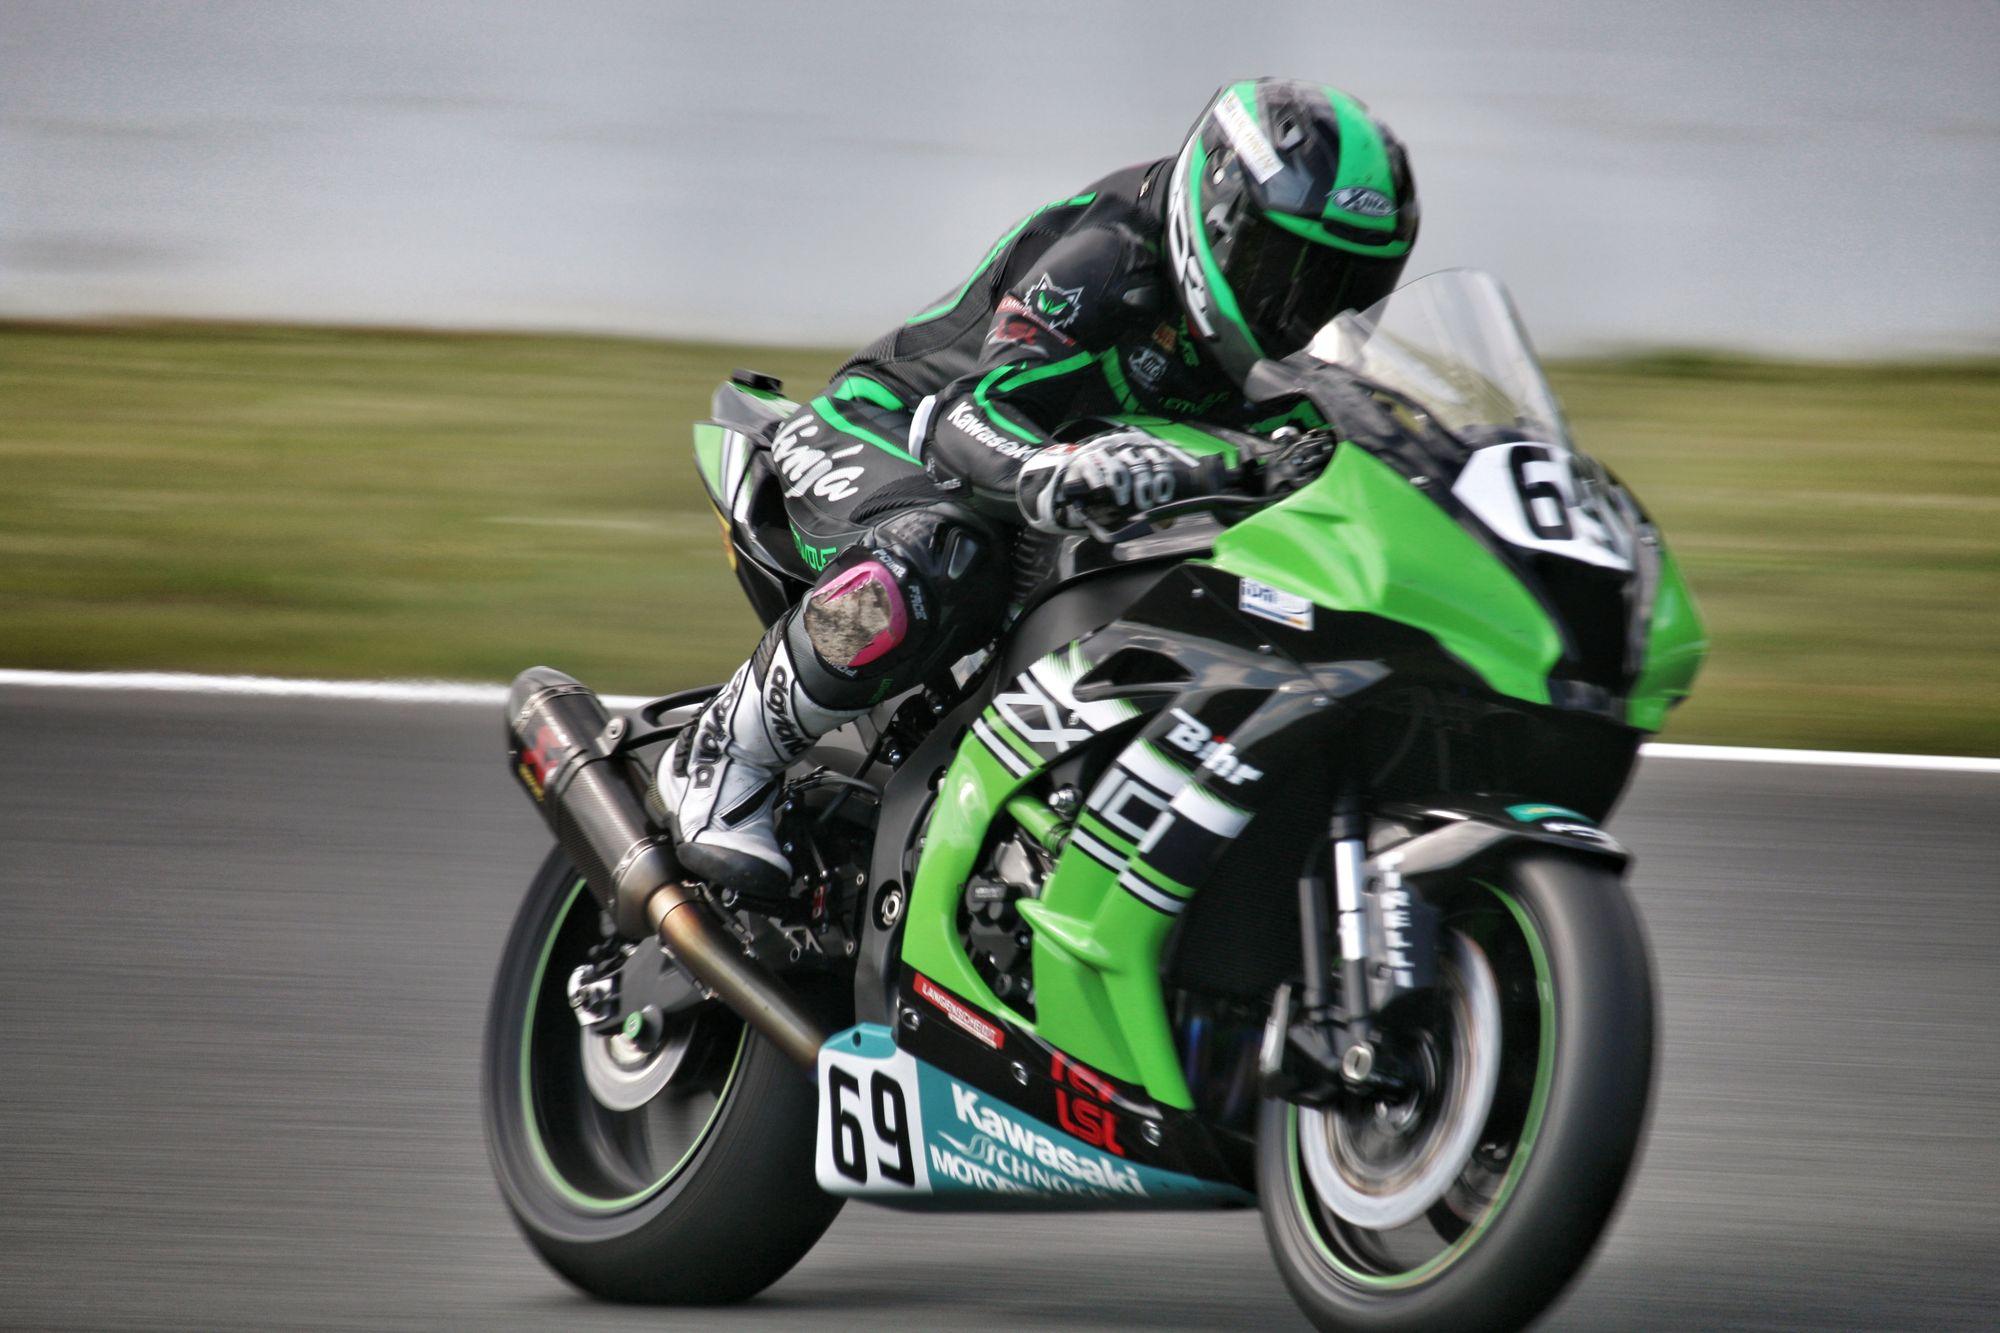 IDM 2018 Motorsportarena Oschersleben - Lucy Glöckner - Kawasaki Schnock Team Motorex